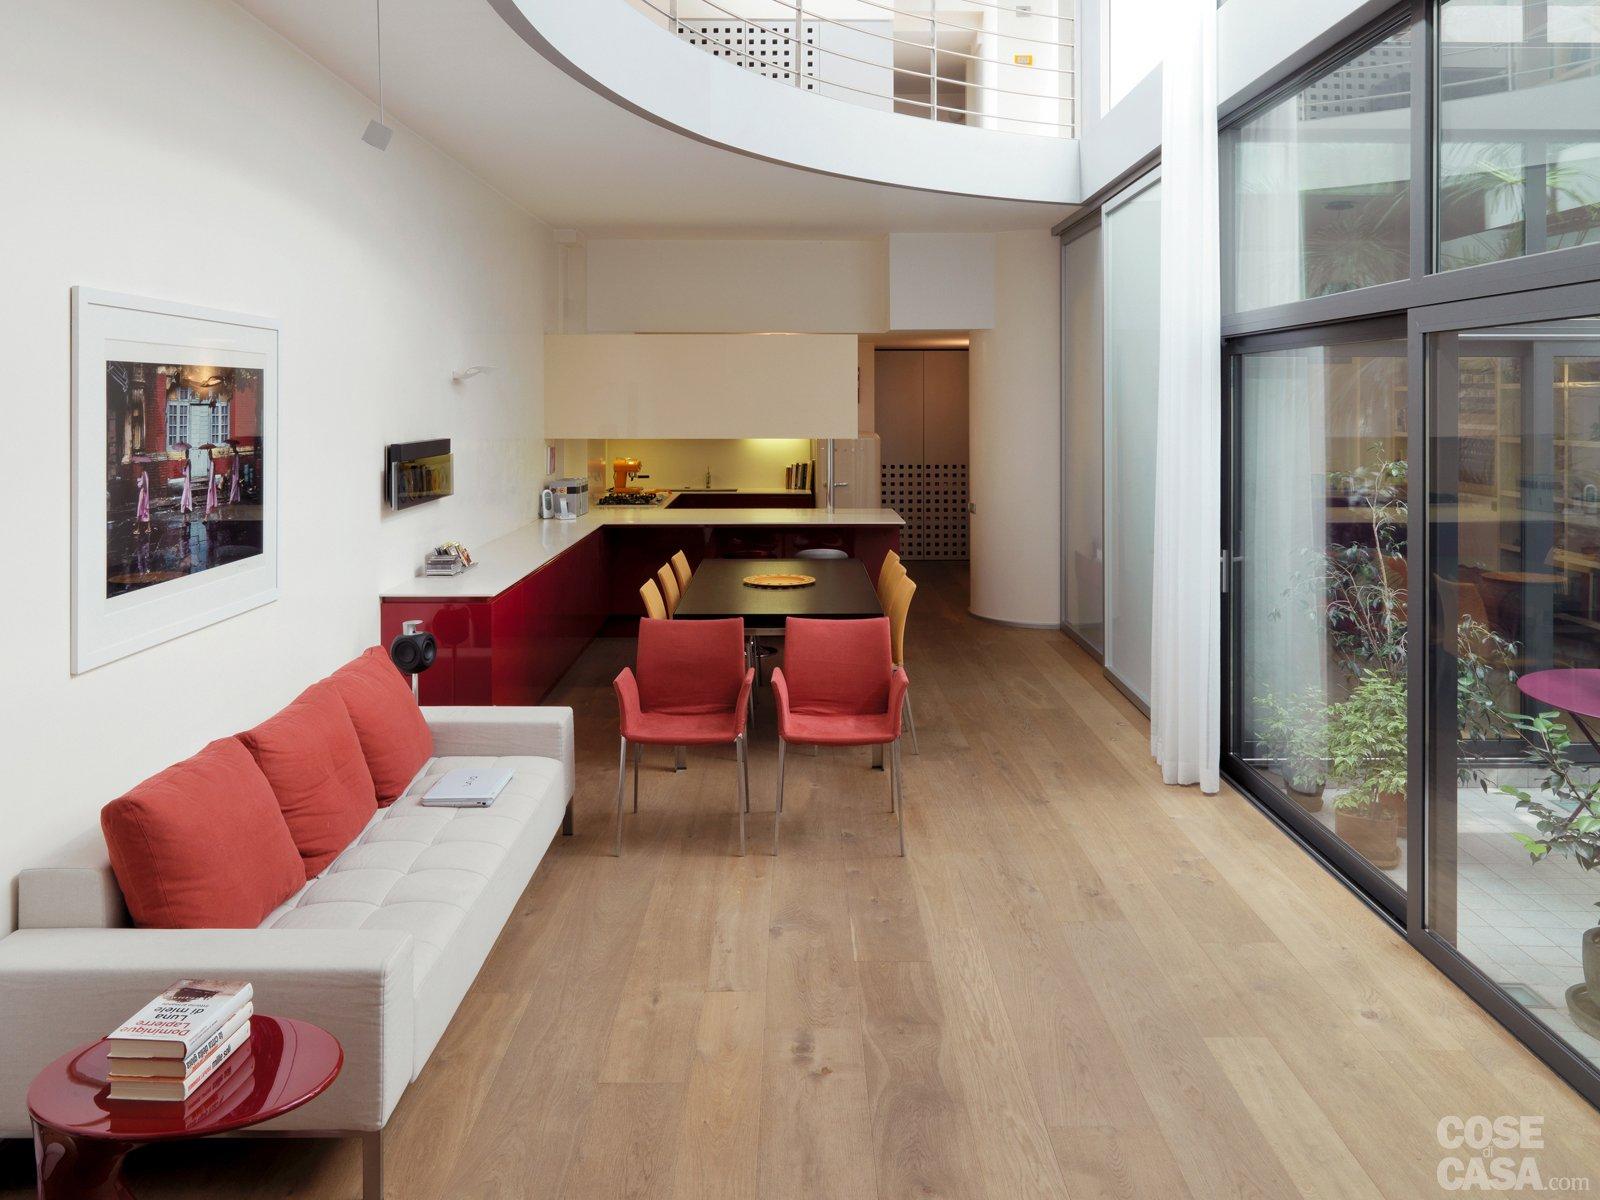 Una casa su due piani da un ex garage cose di casa for Piani di casa storici